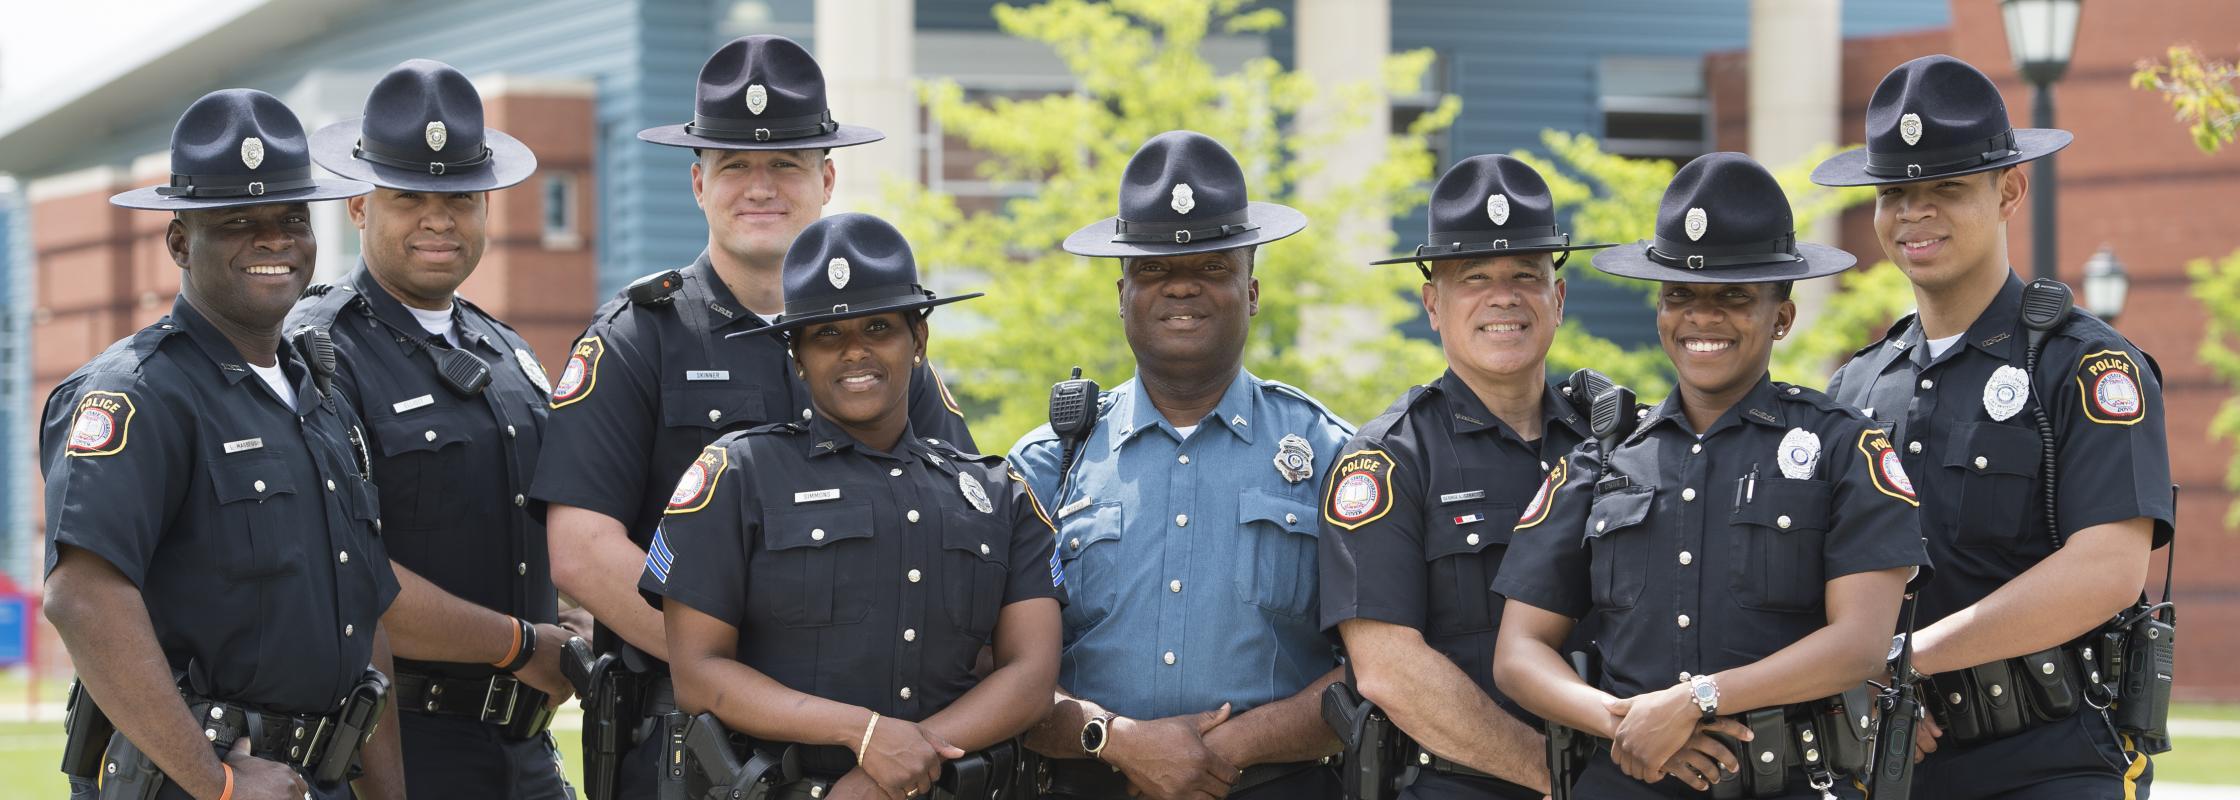 DSU Police Department Staff